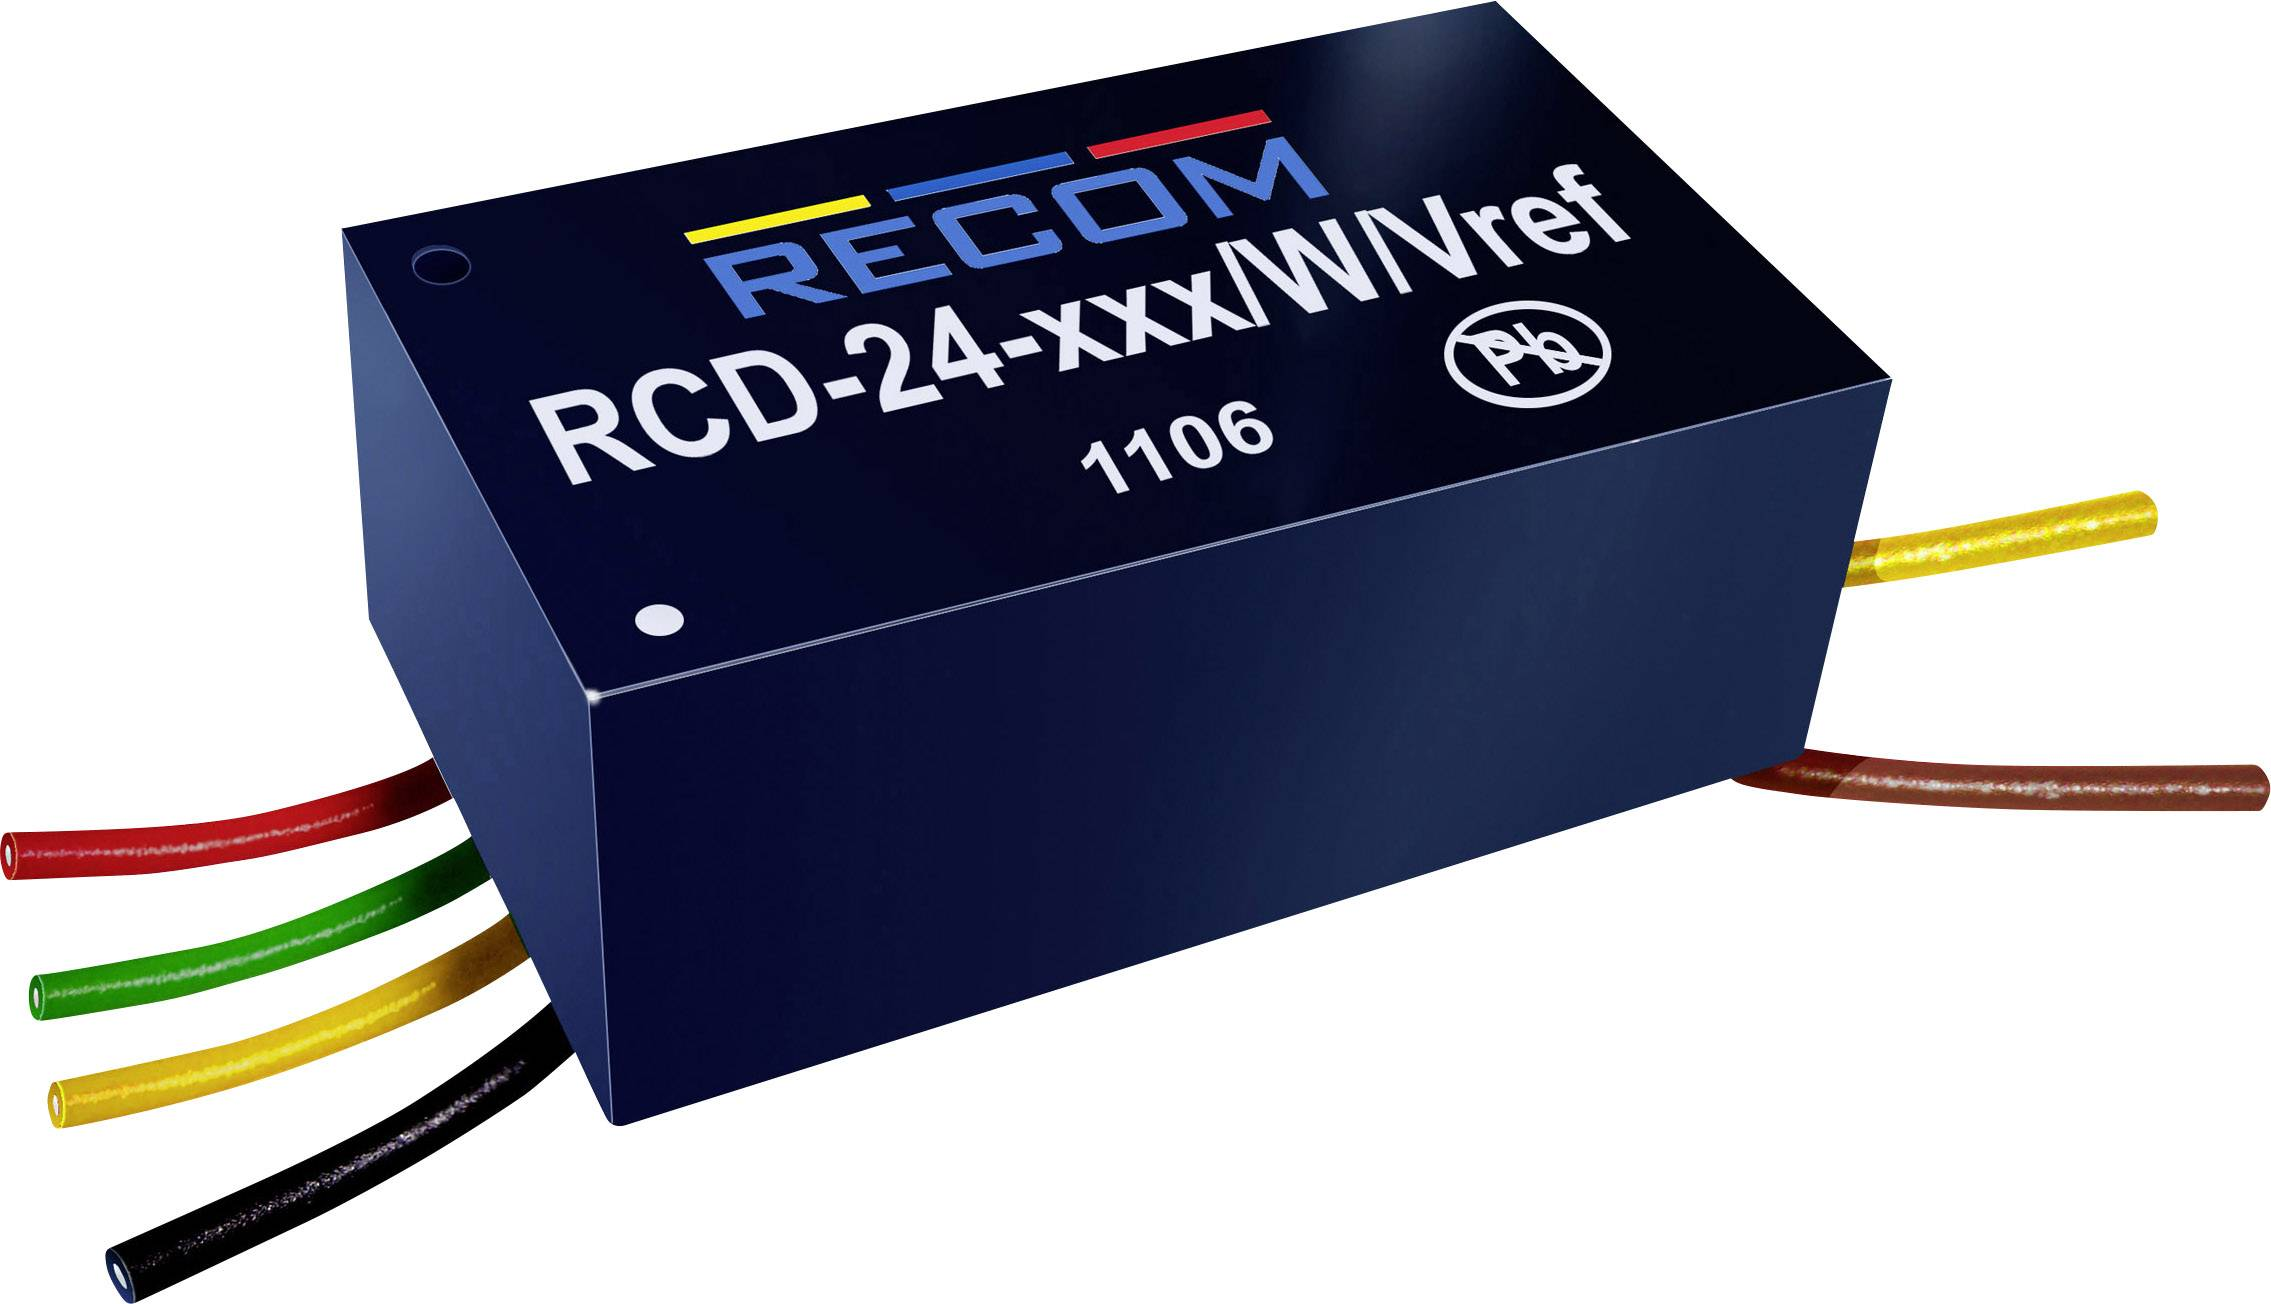 LED ovladač Recom Lighting RCD-24-0.35/W/Vref, 4.5-36 V/DC